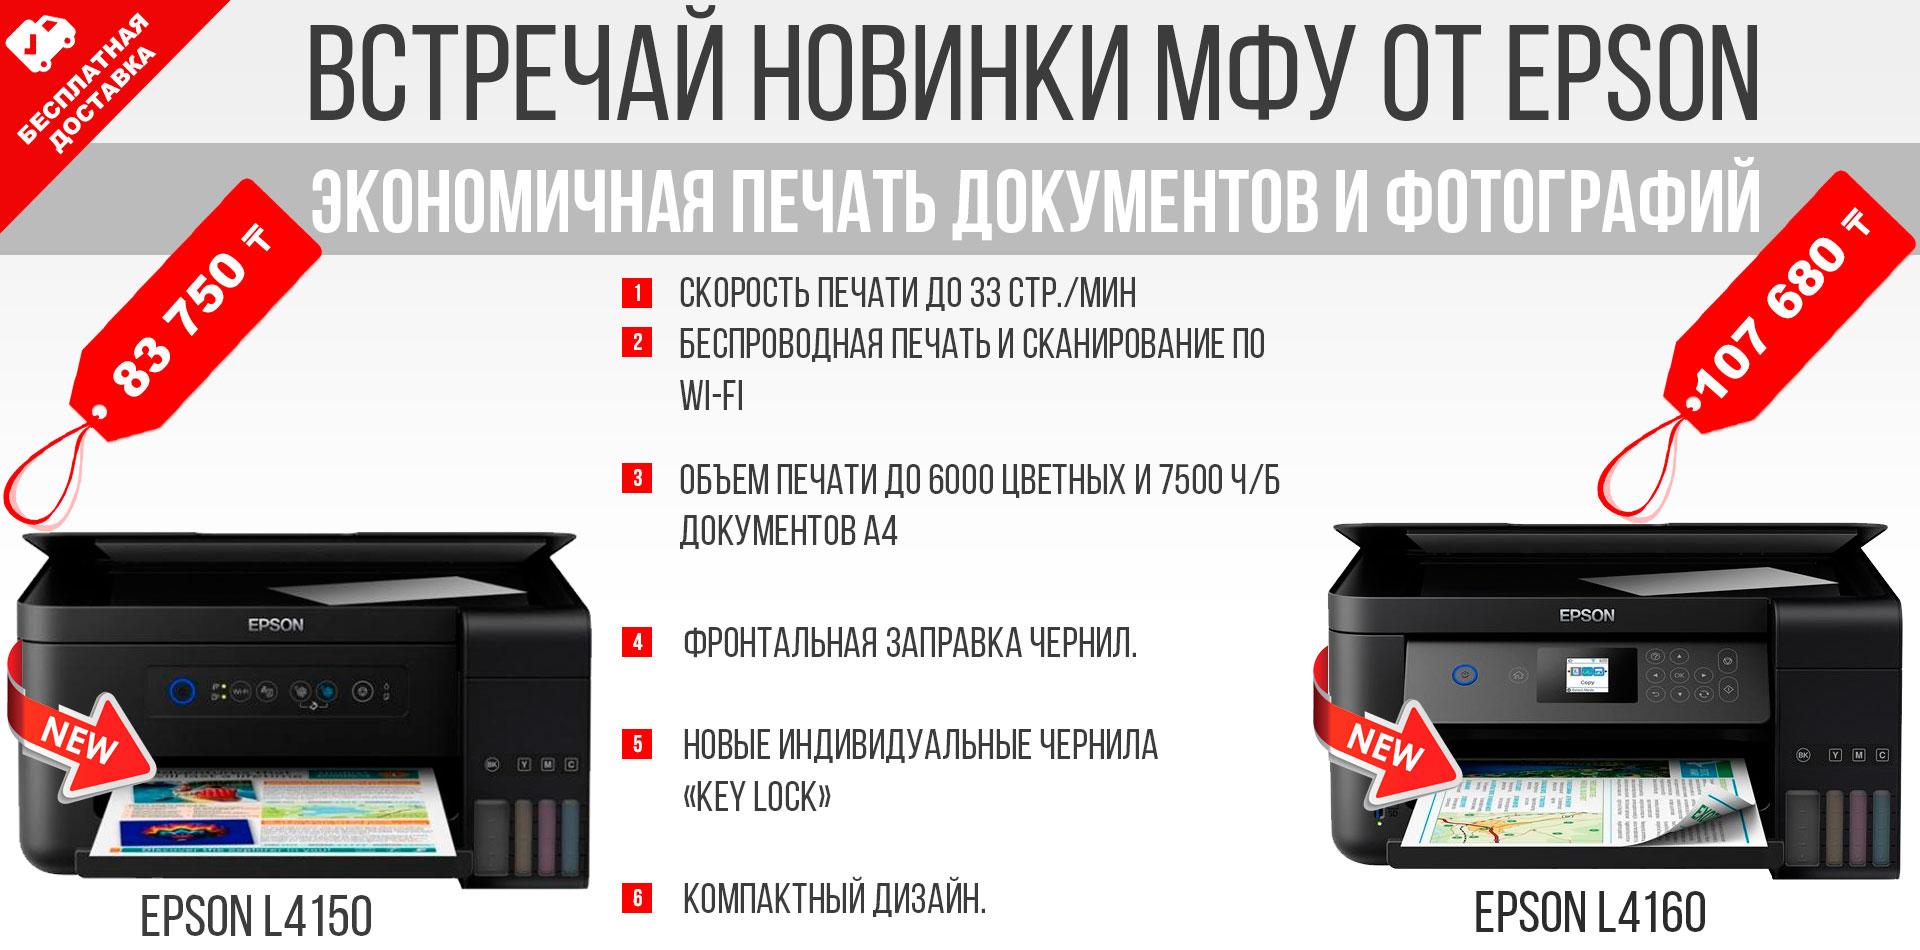 МФУ EPSON В АСТАНЕ